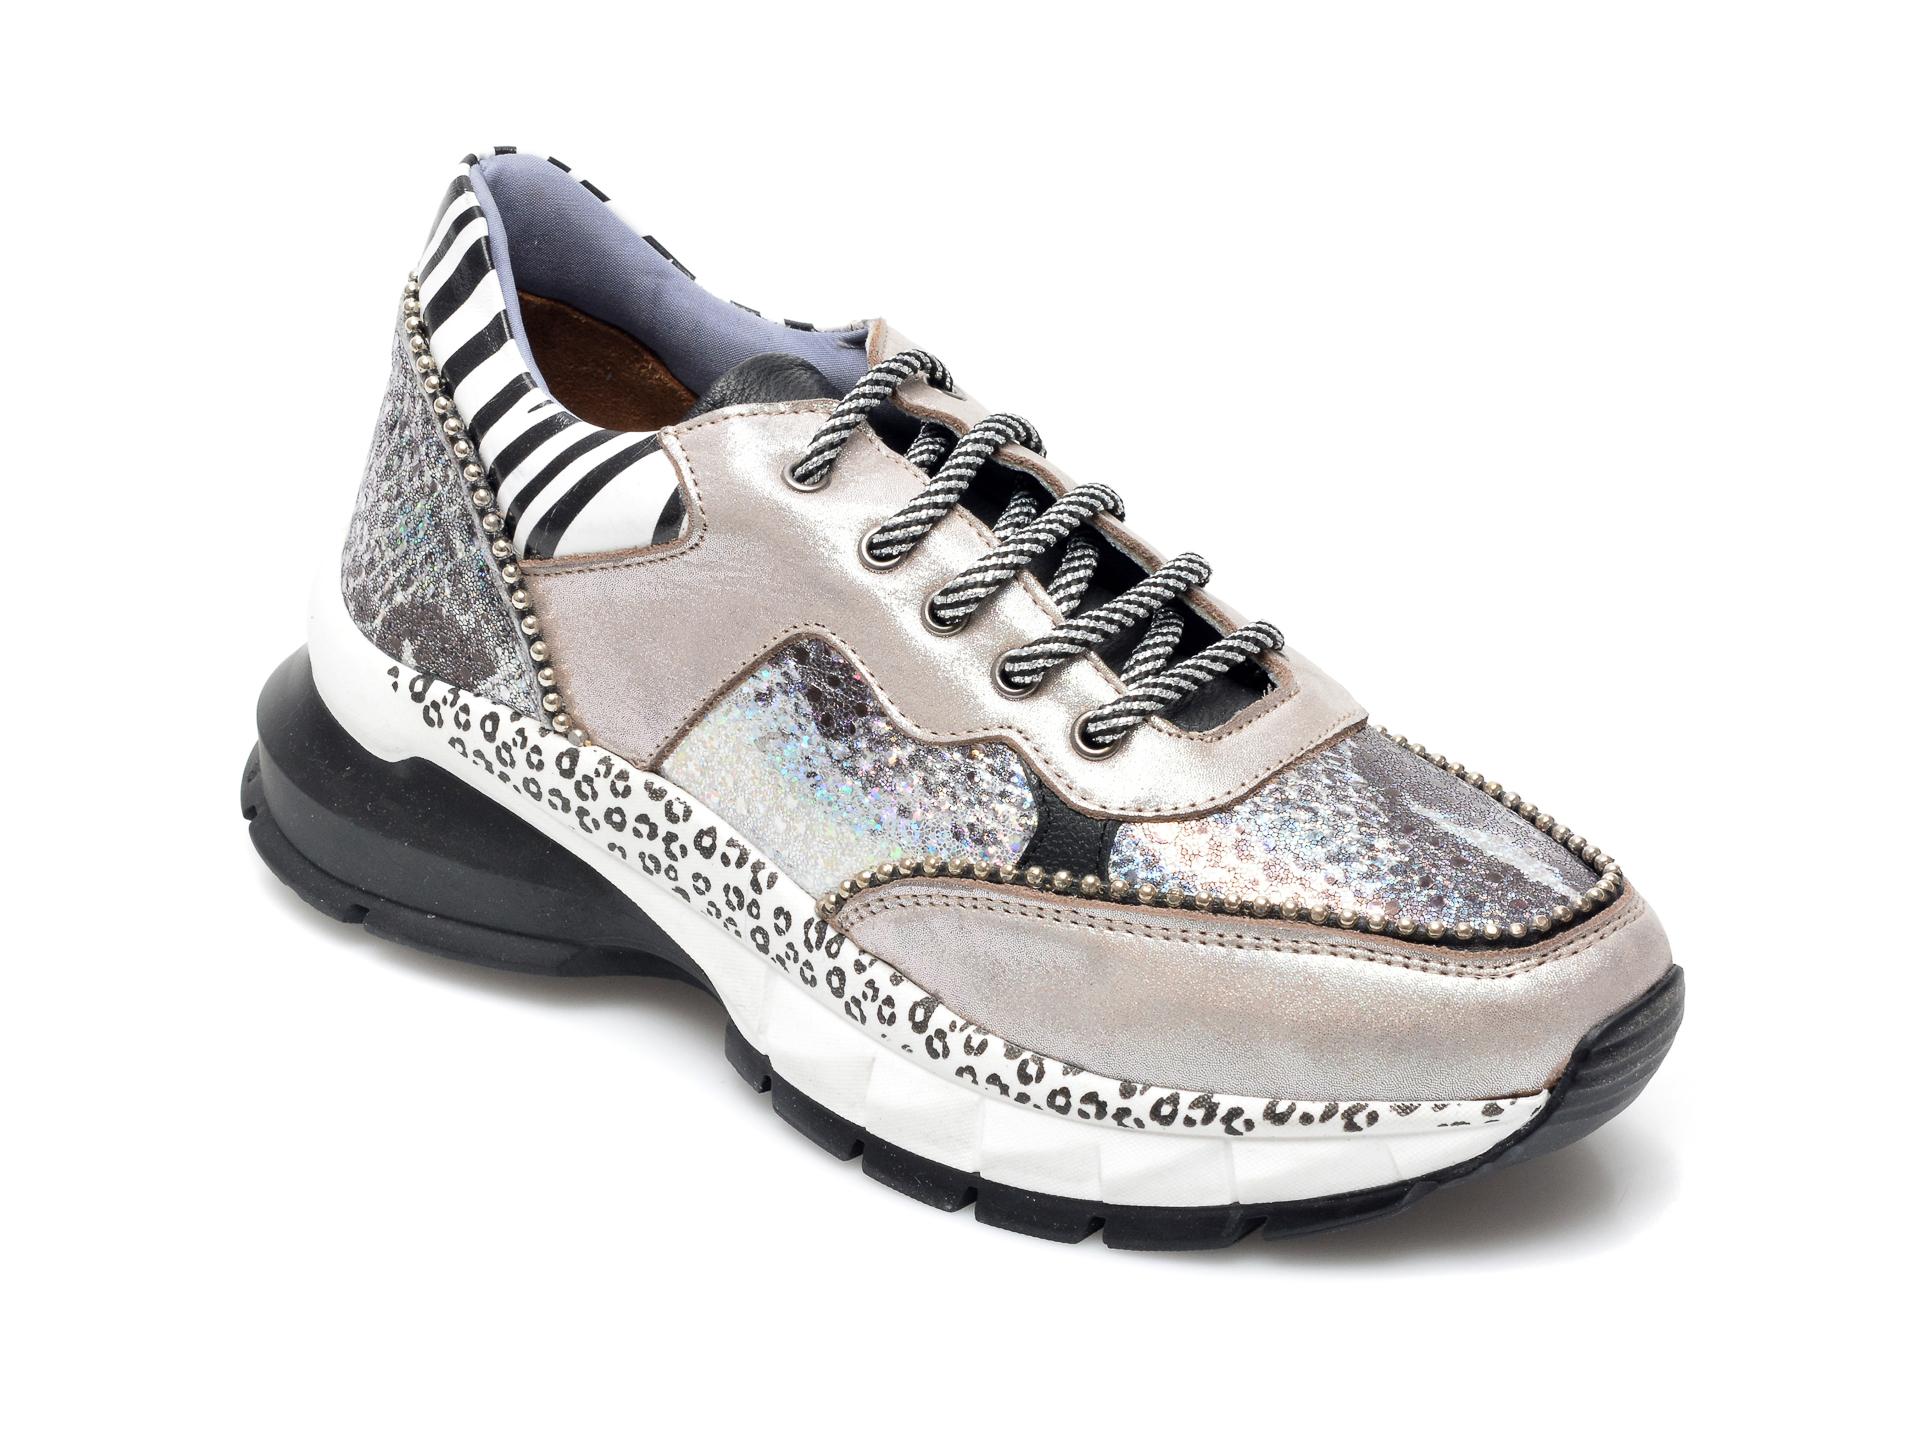 Pantofi sport ROE&DOE gri, 1201, din piele naturala imagine otter.ro